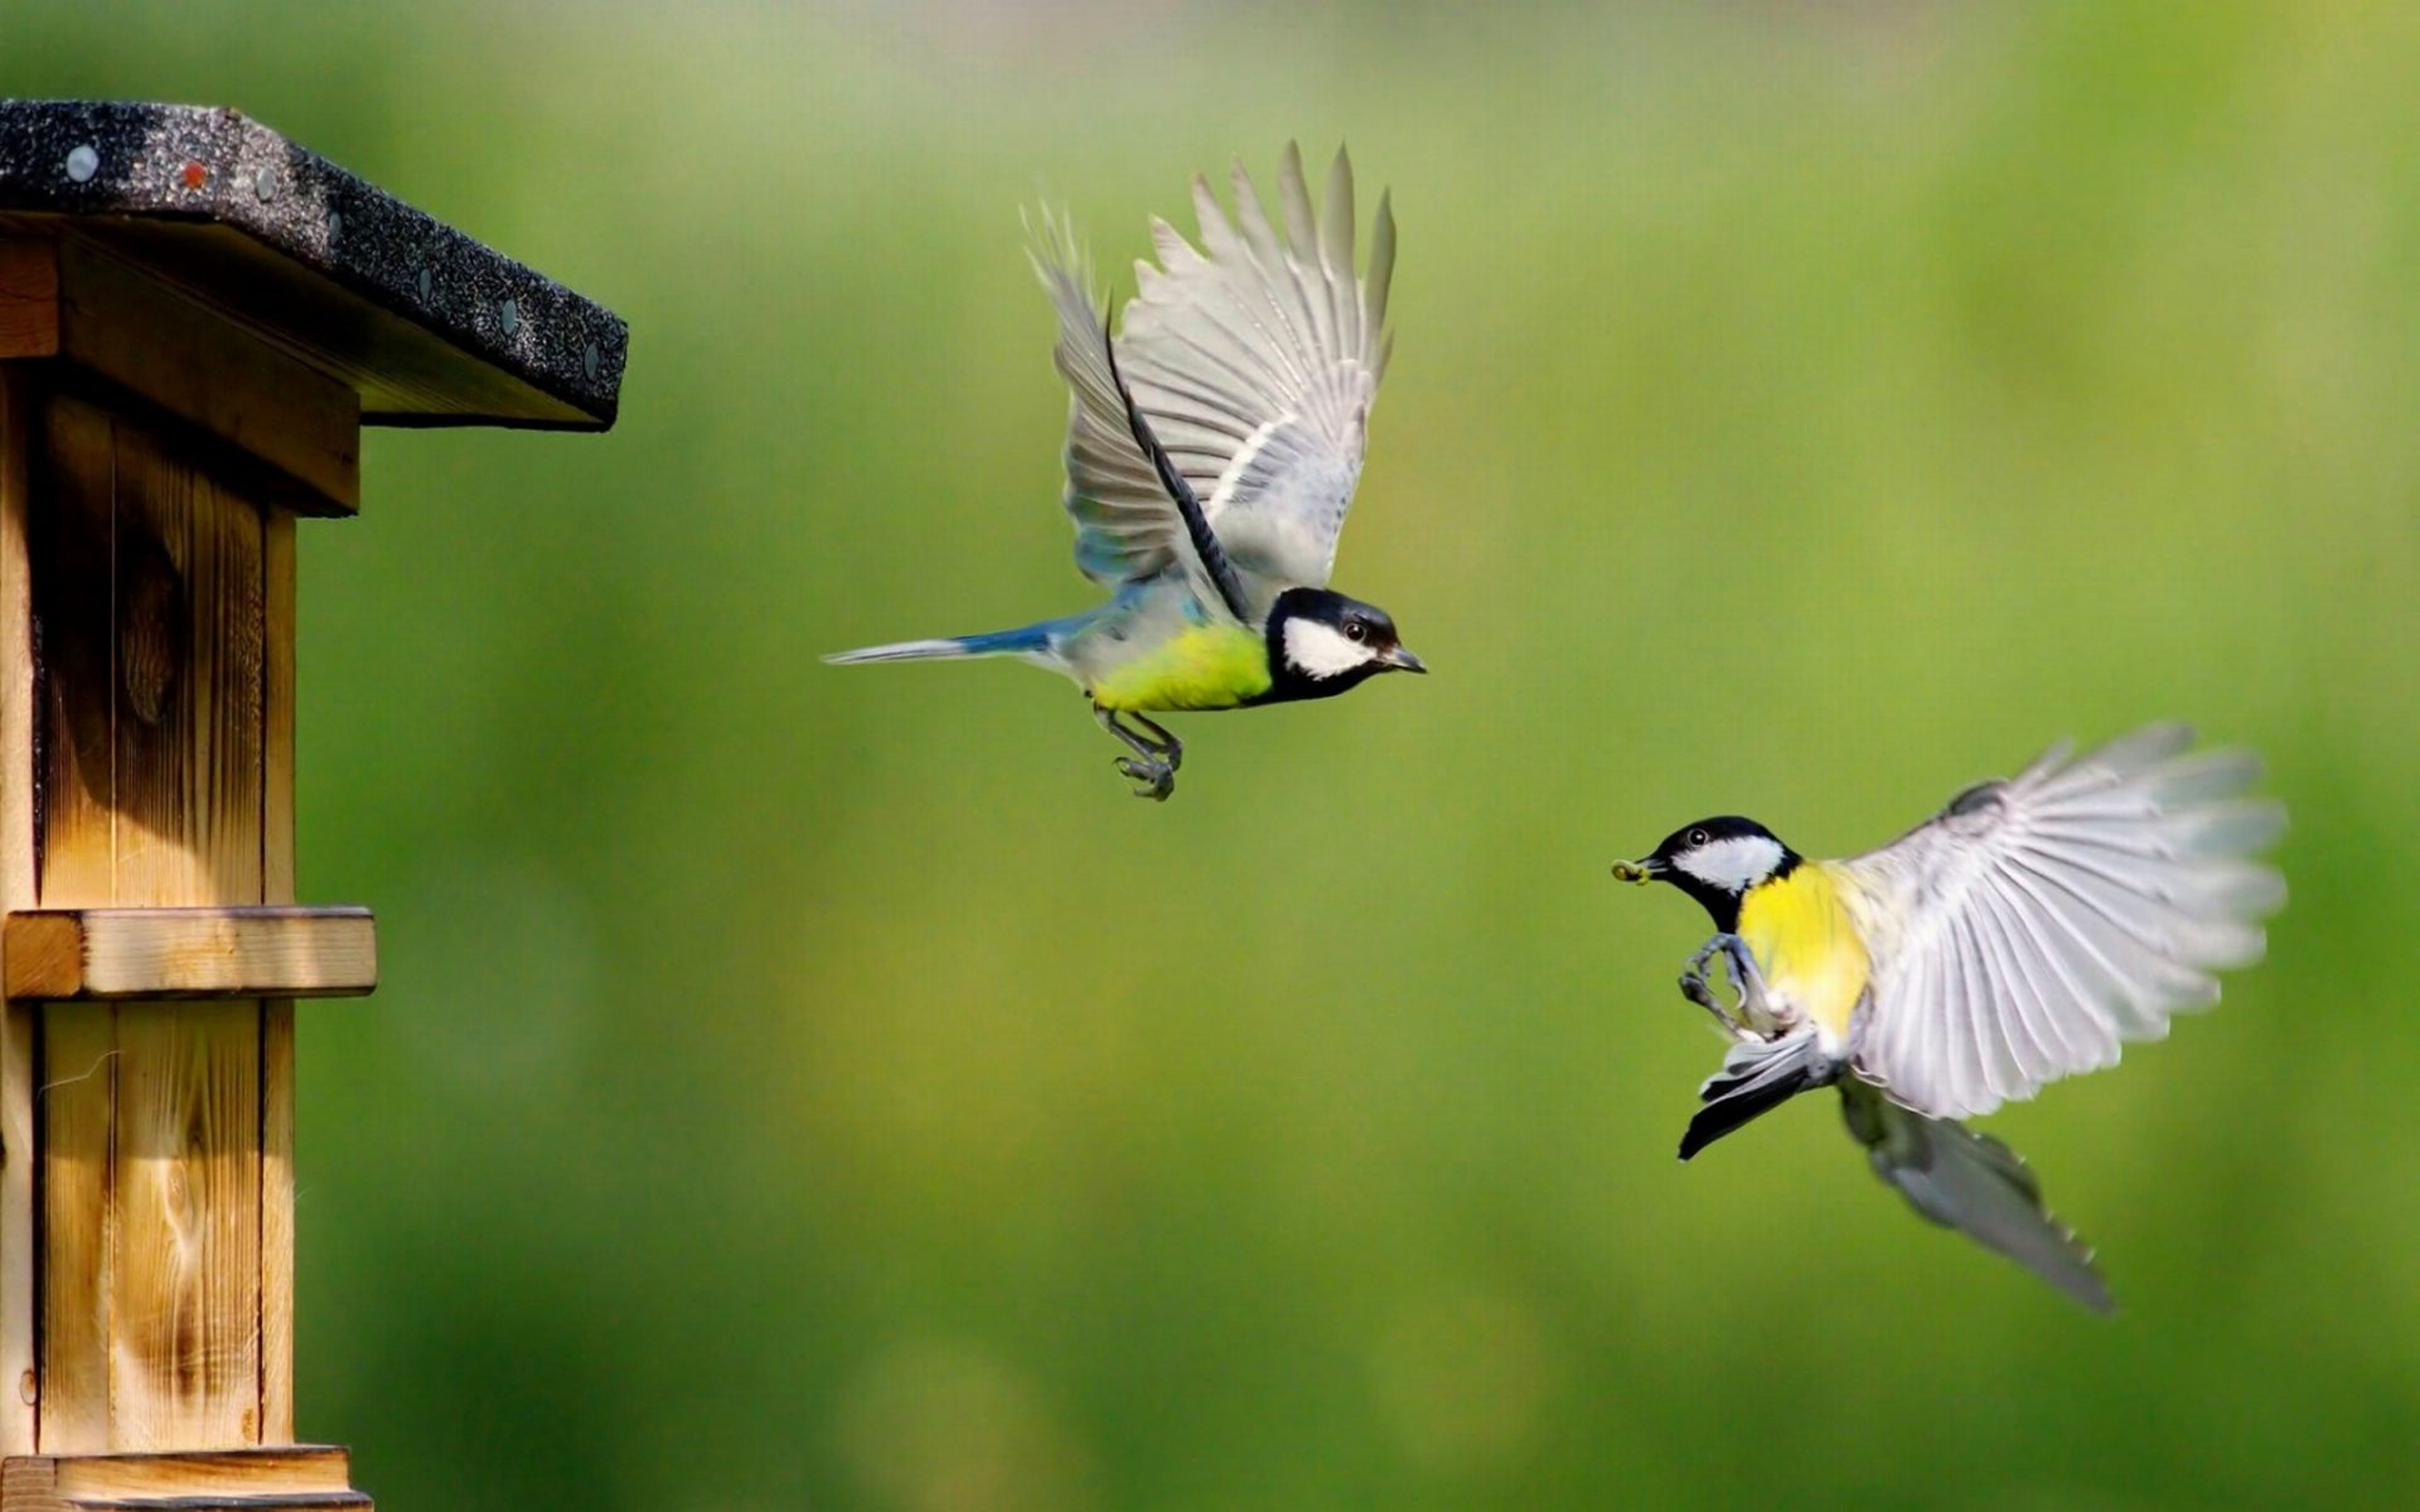 Eurasian Blue Tit Birds In Flight Hd Wallpapers For Mobile Phones ...